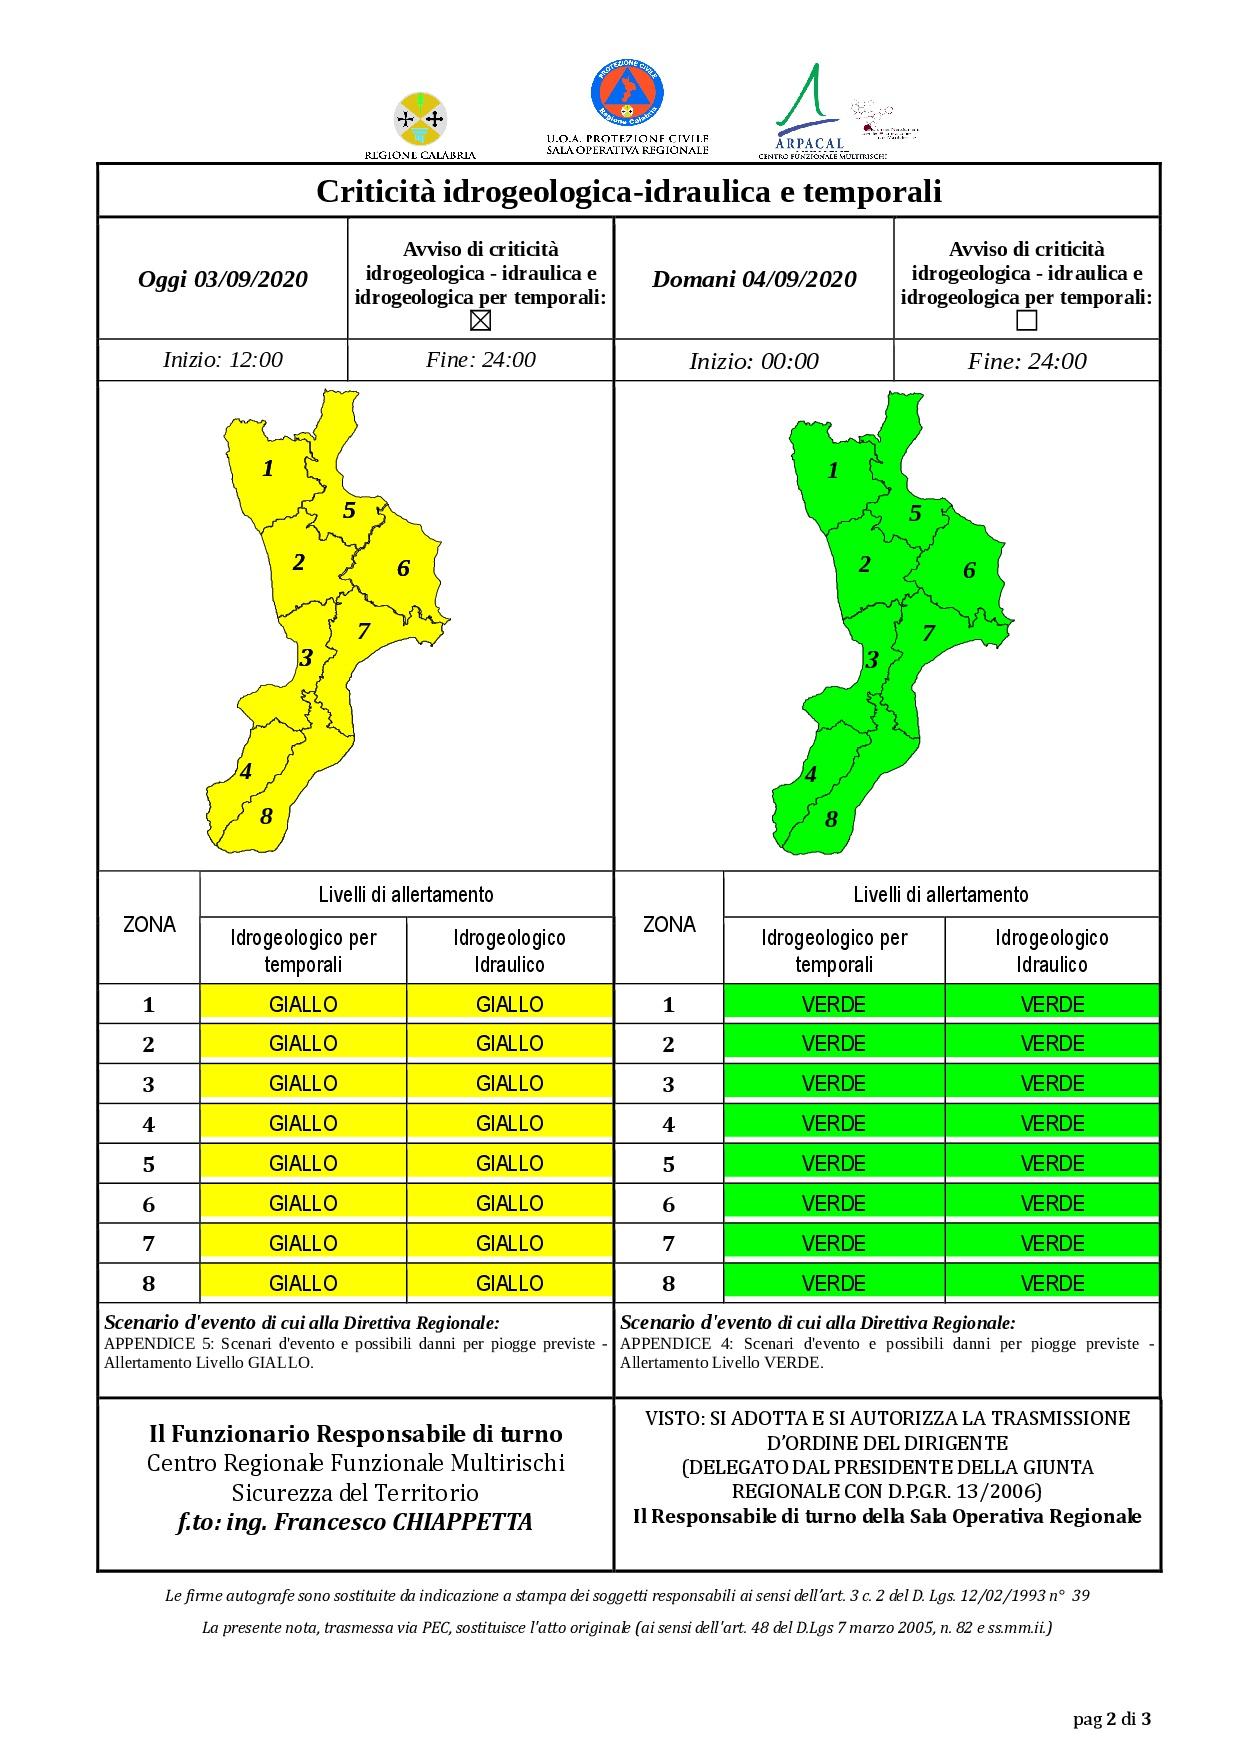 Criticità idrogeologica-idraulica e temporali in Calabria 03-09-2020